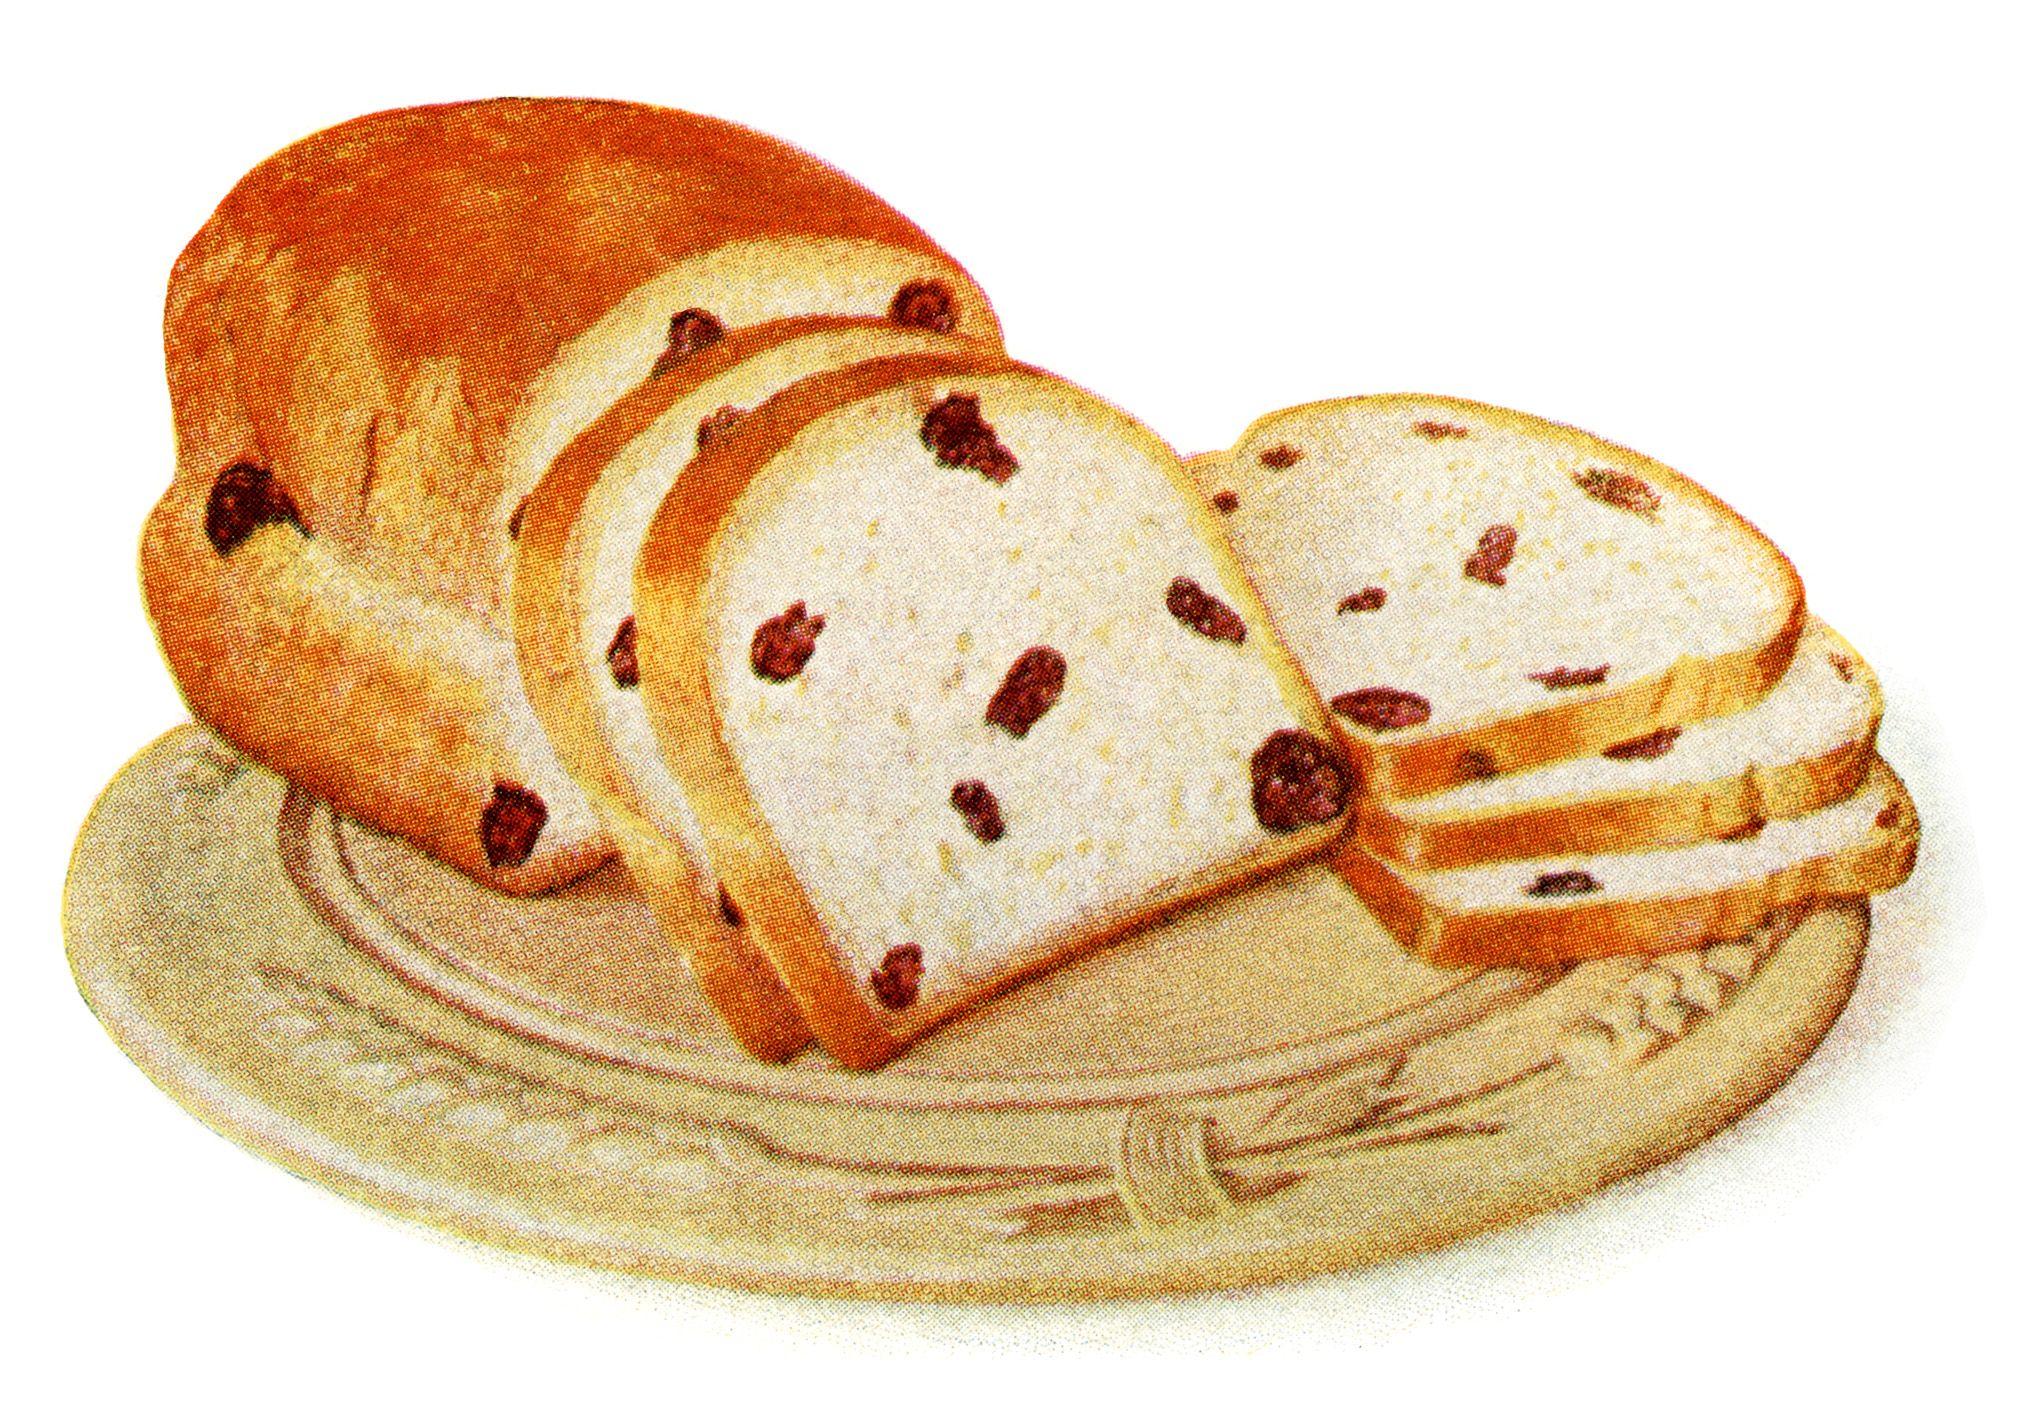 Bread clipart homemade bread. Loaf of raisin free